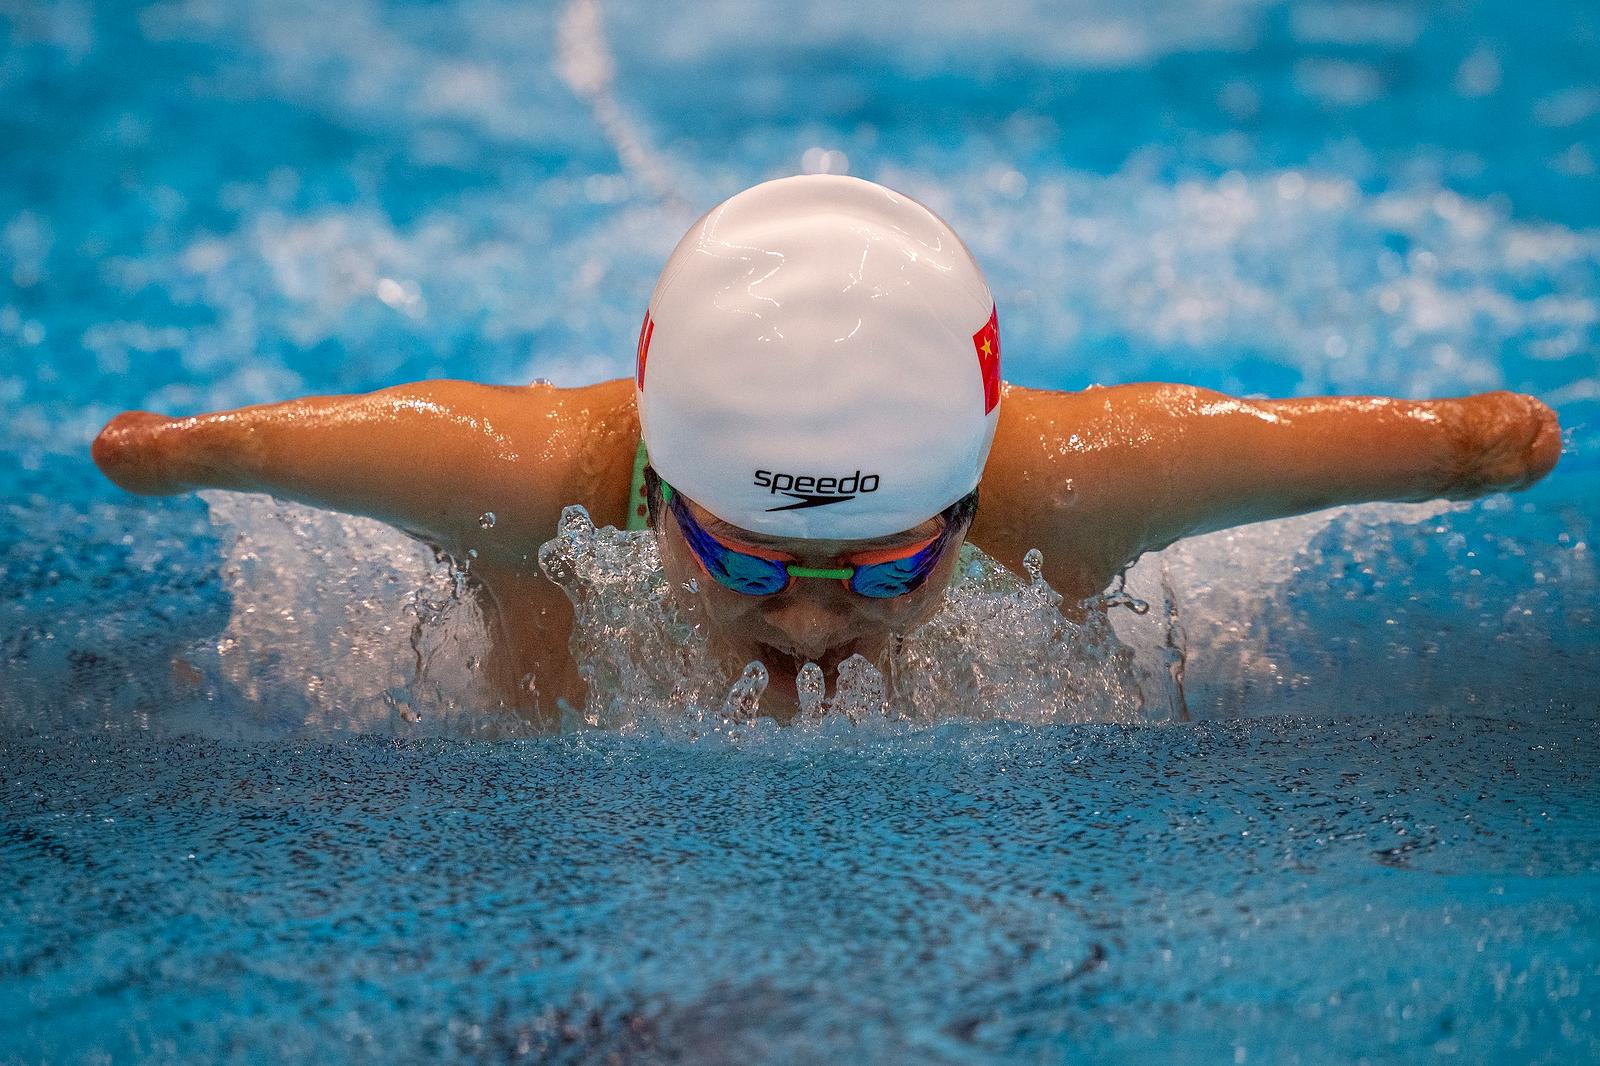 Daomin Liu competes at Women's 200m Individual Medley - SM6 Heat 1 at the Tokyo Aquatics Centre during the Tokyo 2020 Paralympic Games, Thursday, Aug. 26, 2021, in Tokyo, Japan. AP